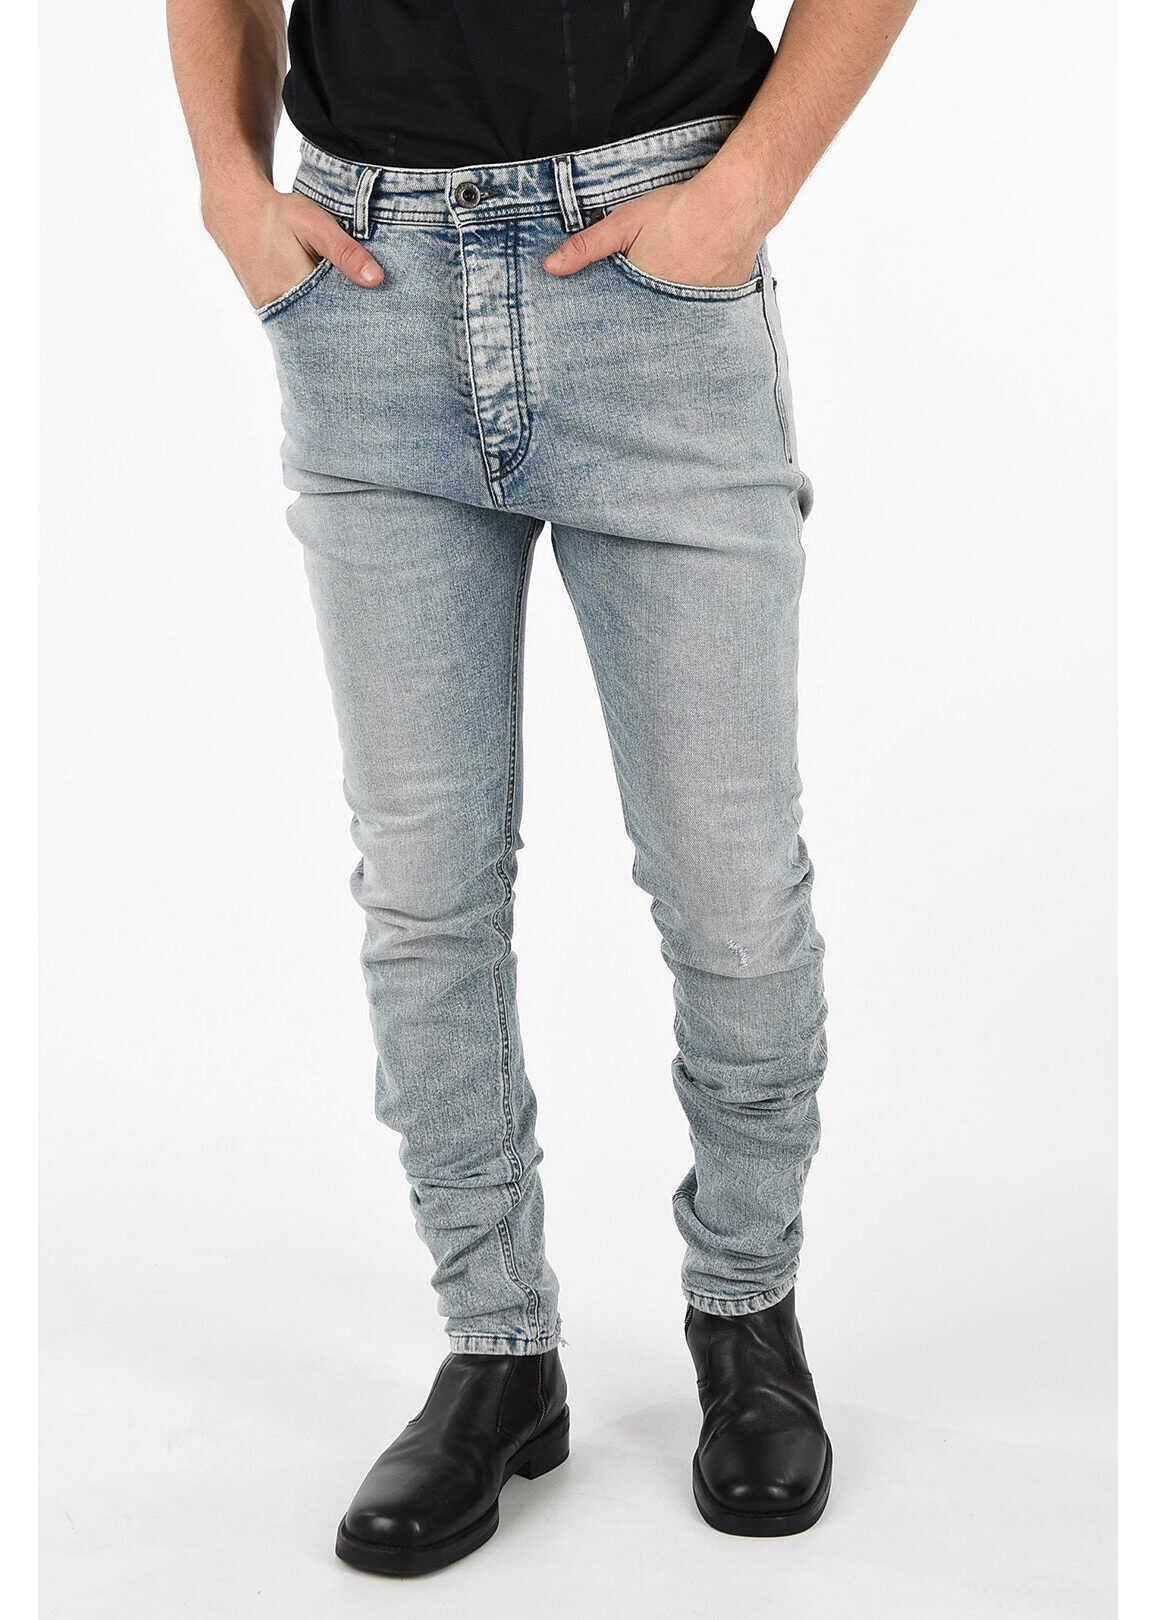 BLACK GOLD 16cm Slim Fit TYPE-2830 Jeans thumbnail